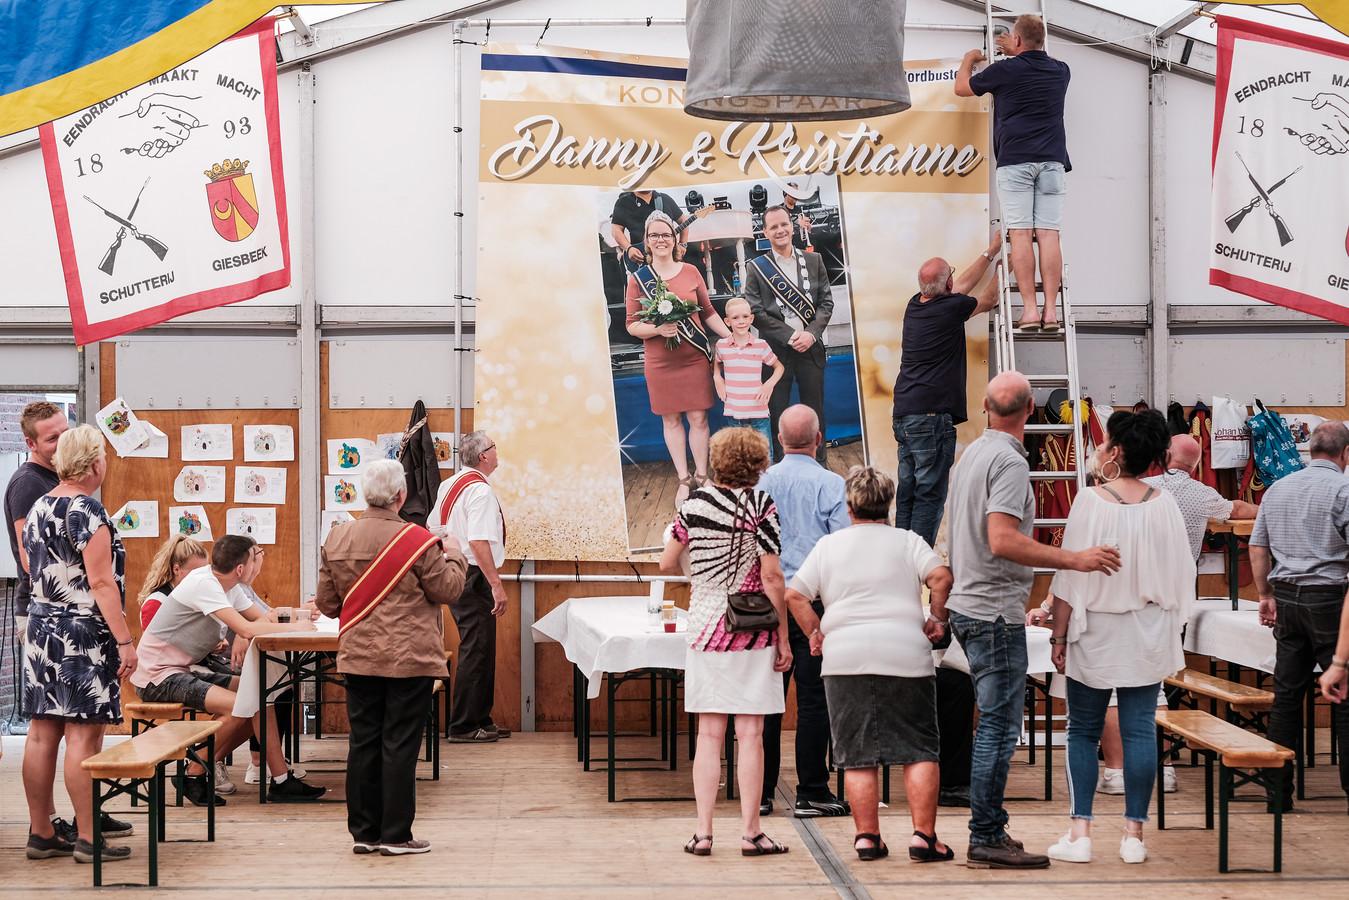 Het nieuwe koningspaar van Giesbeek is vereeuwigd op een groot canvas doek.